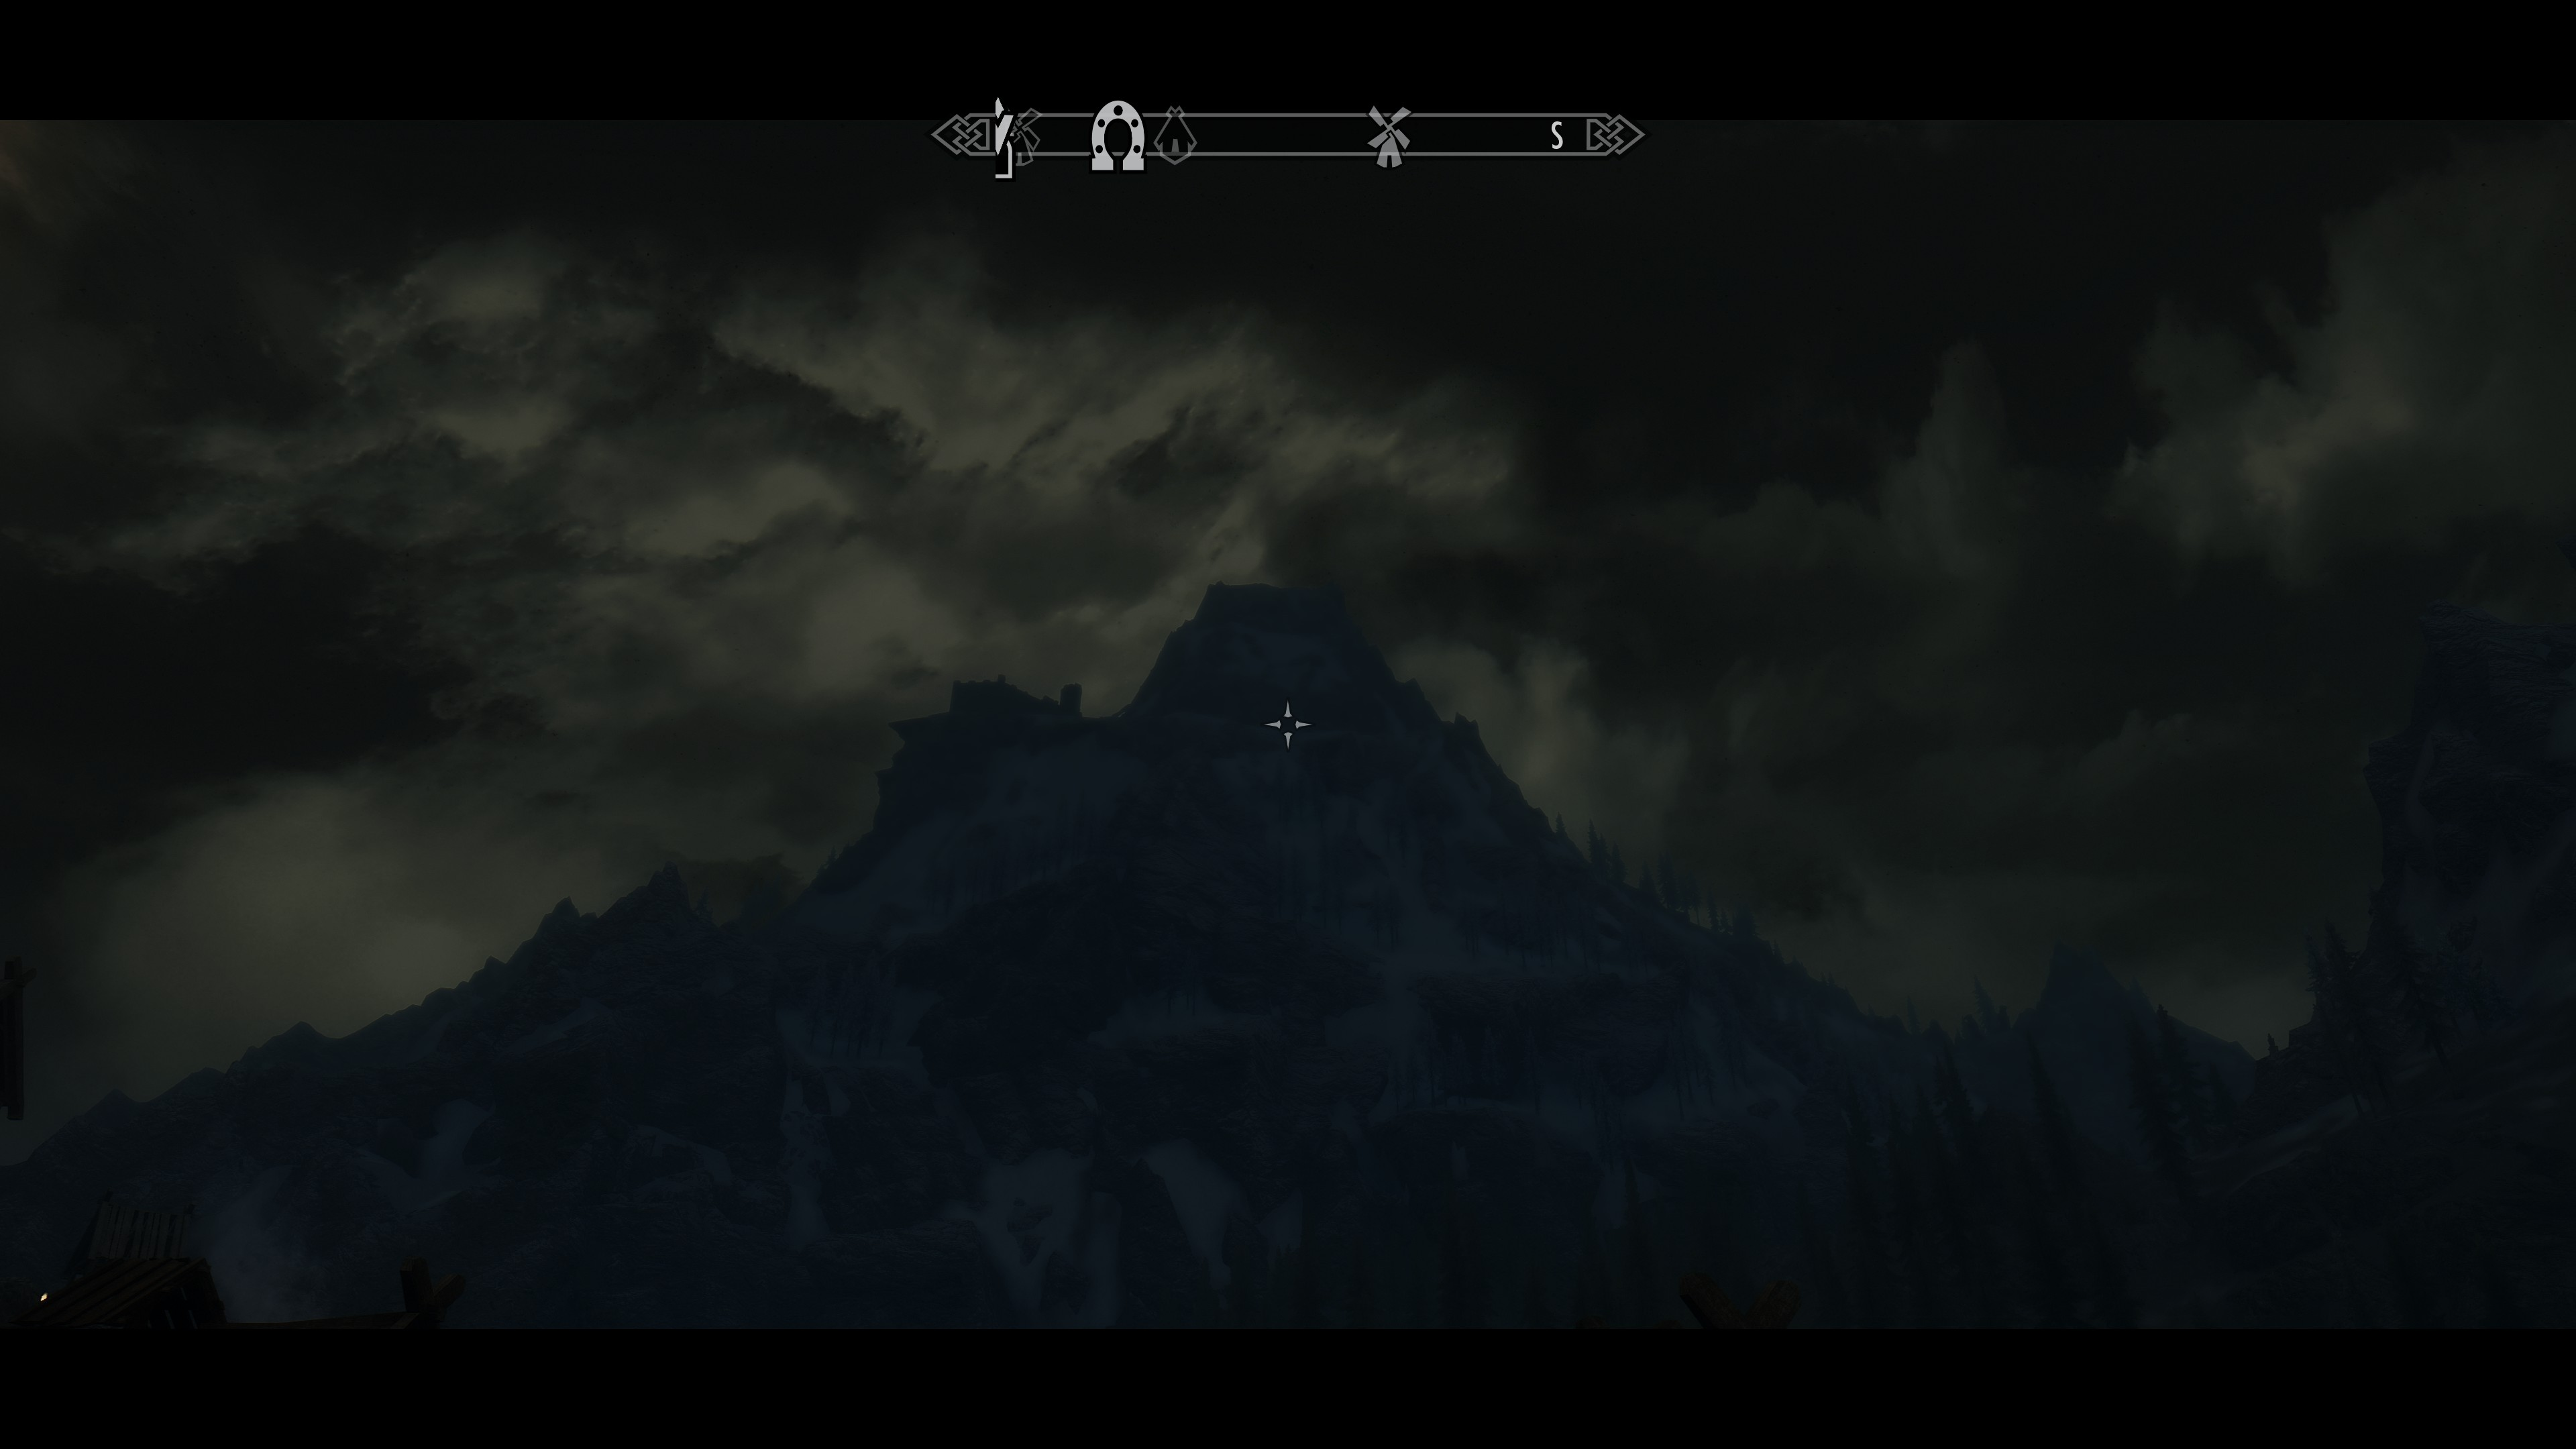 20191204202253_1.jpg - The Elder Scrolls 5: Skyrim